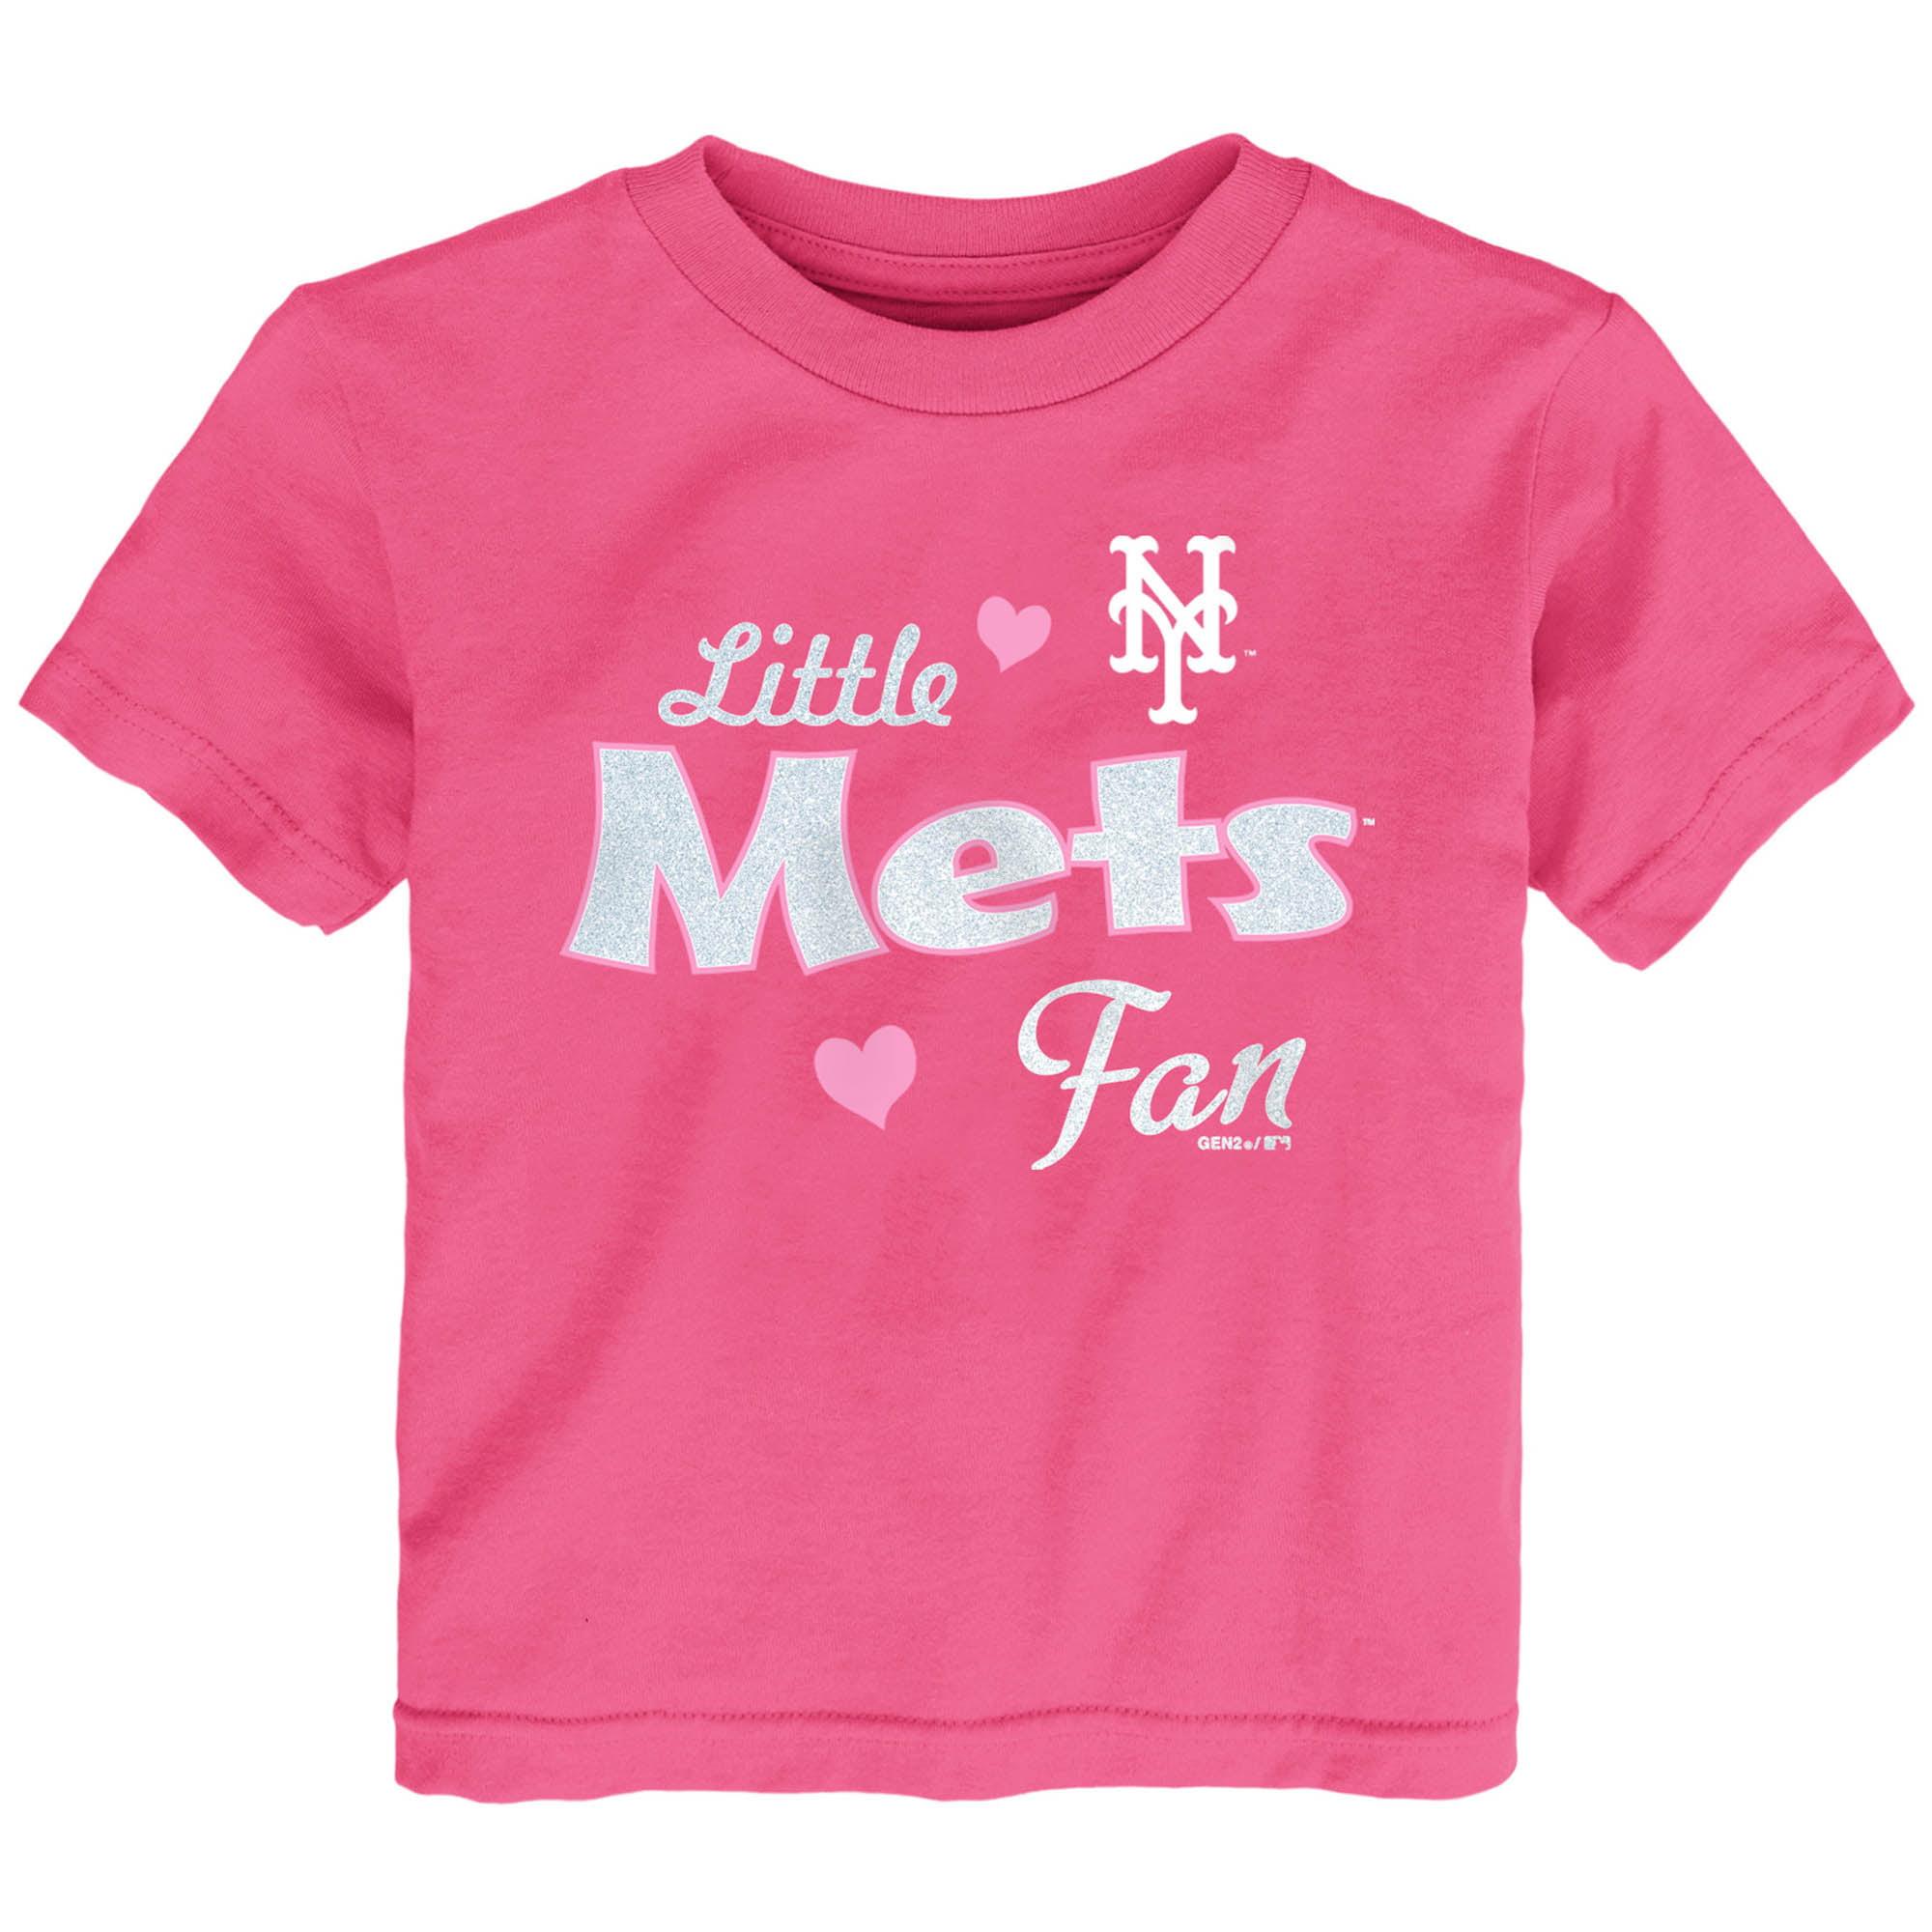 New York Mets Girls Toddler Fan T-Shirt - Pink